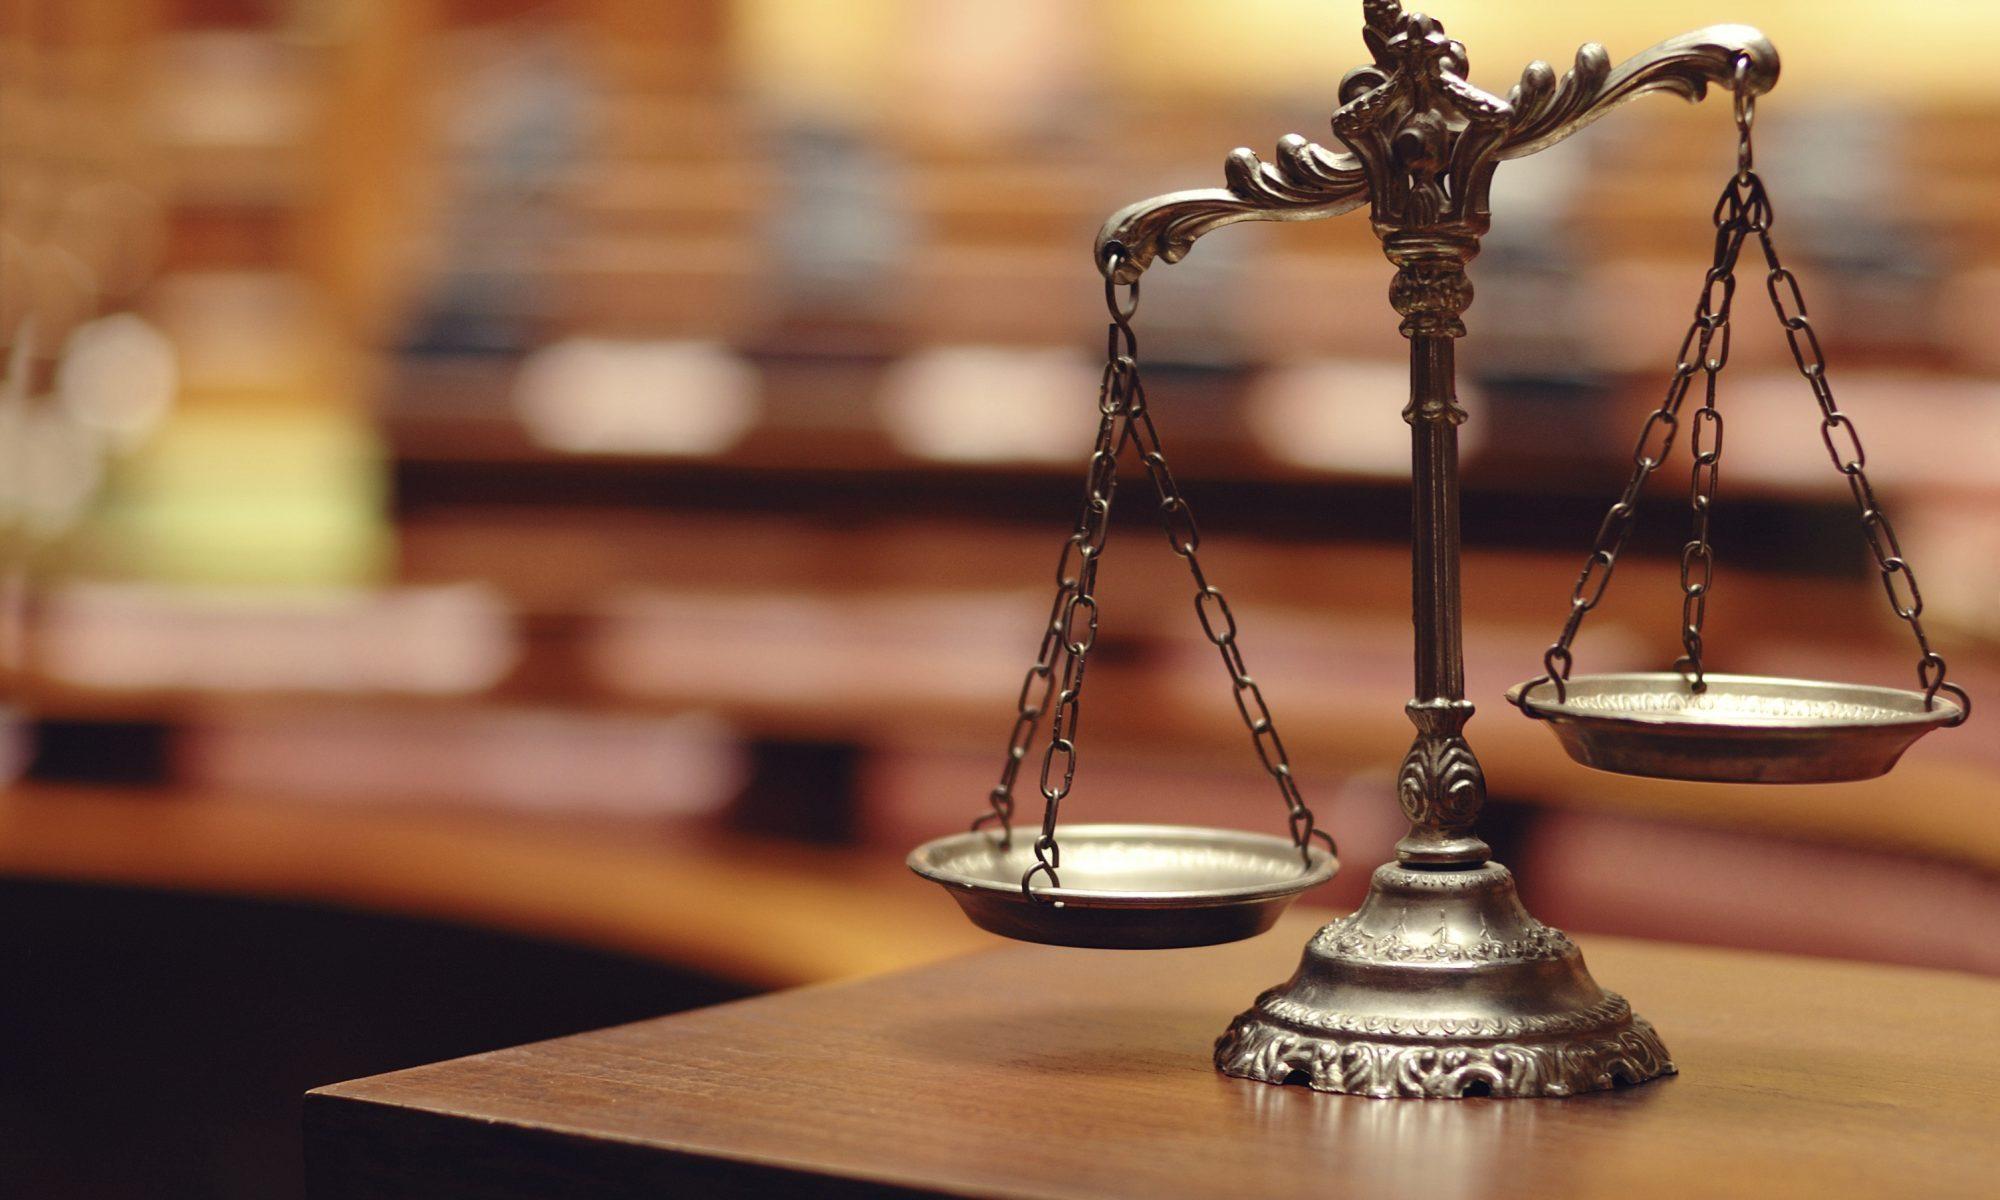 Centro de Ética Legal